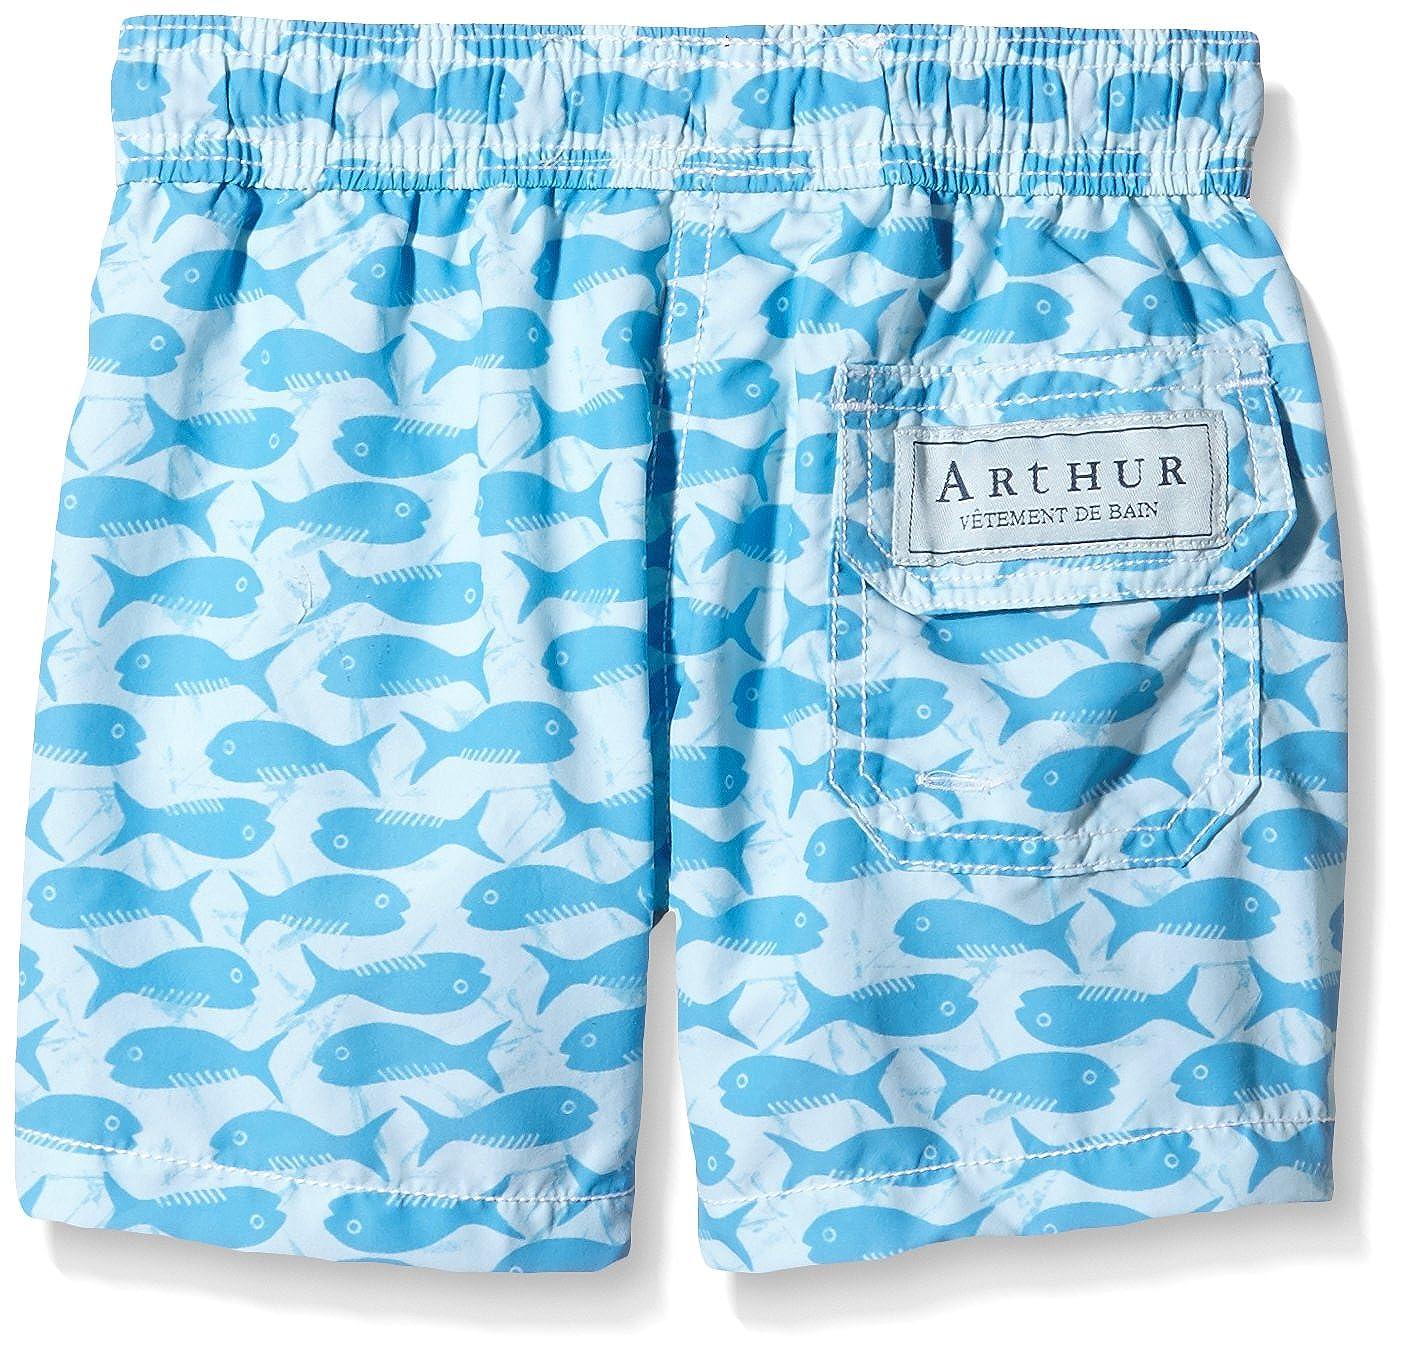 7e7b7e7904 Arthur Short de Bain African Lagon, Garçon, Bleu, FR: 24 Mois (Taille  Fabricant: 2 Ans): Amazon.fr: Vêtements et accessoires